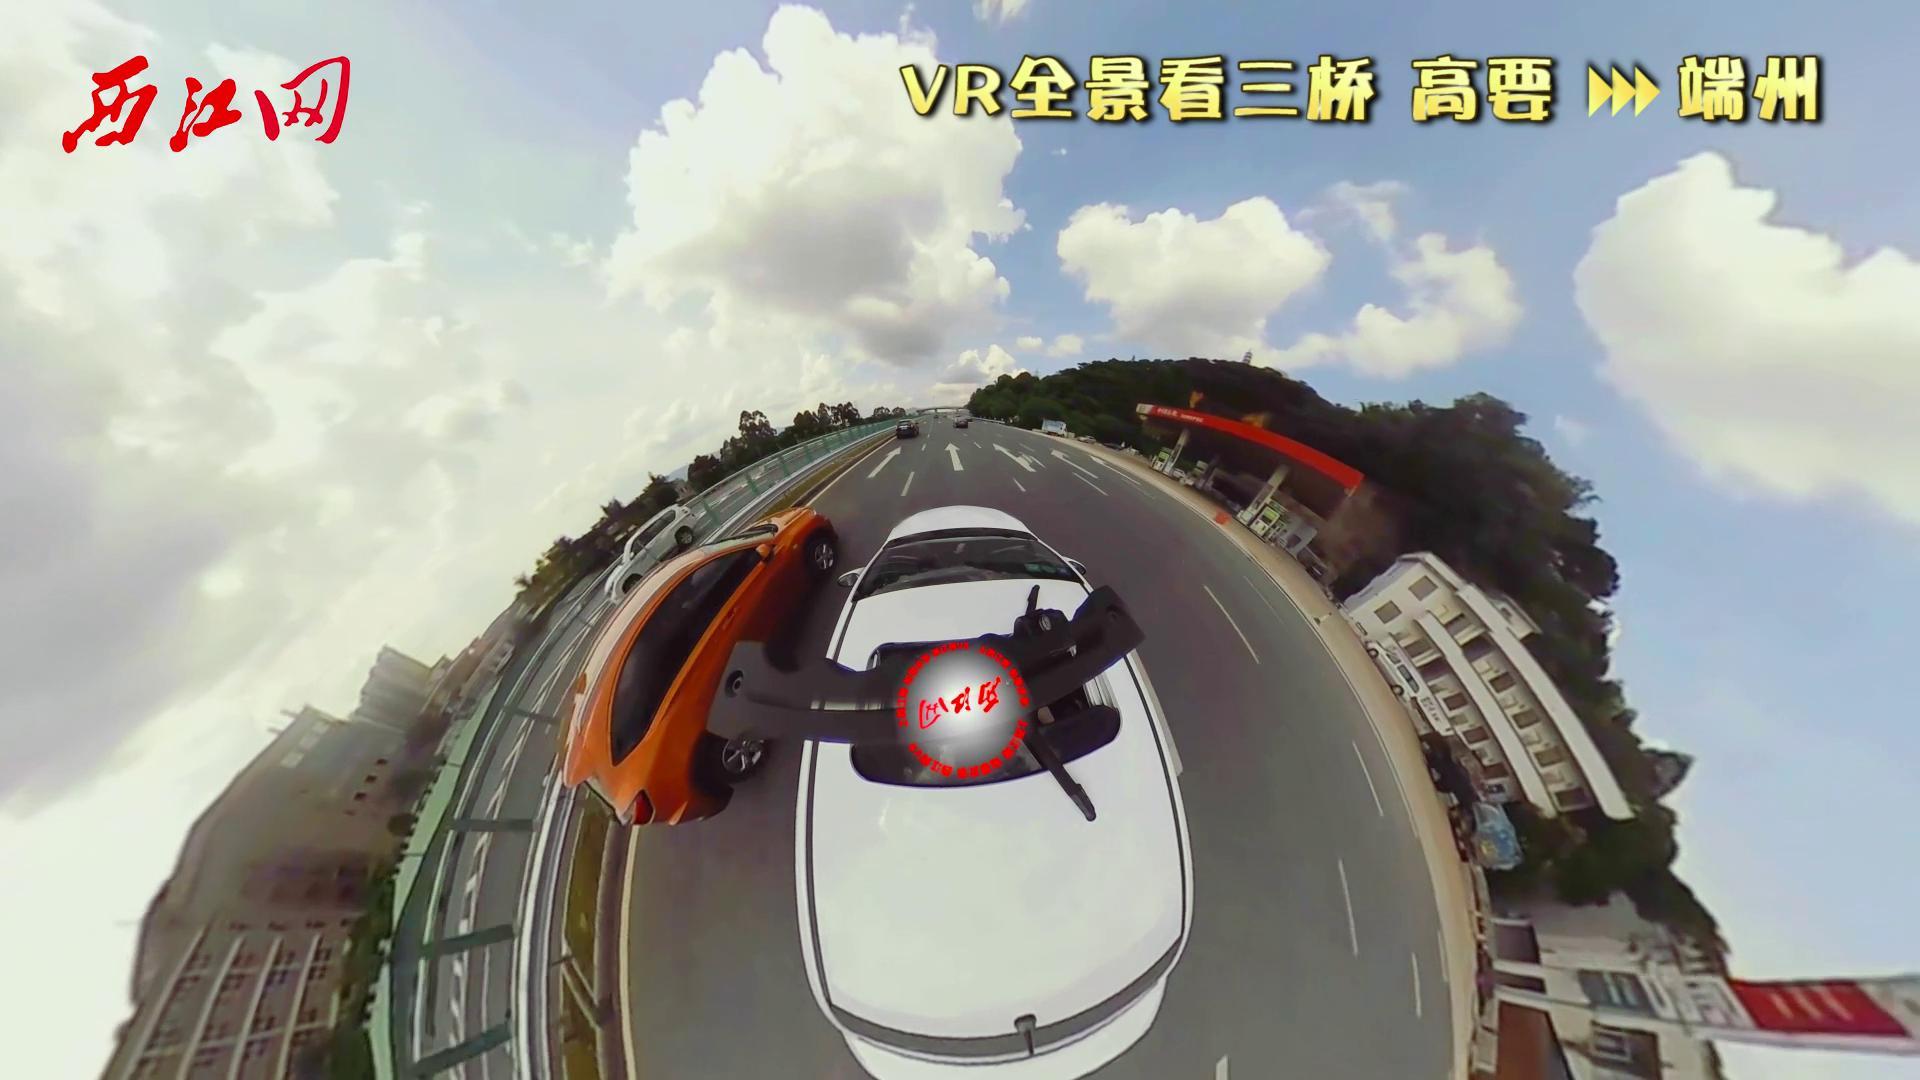 VR小行星视角带你看三桥(高要往端州)